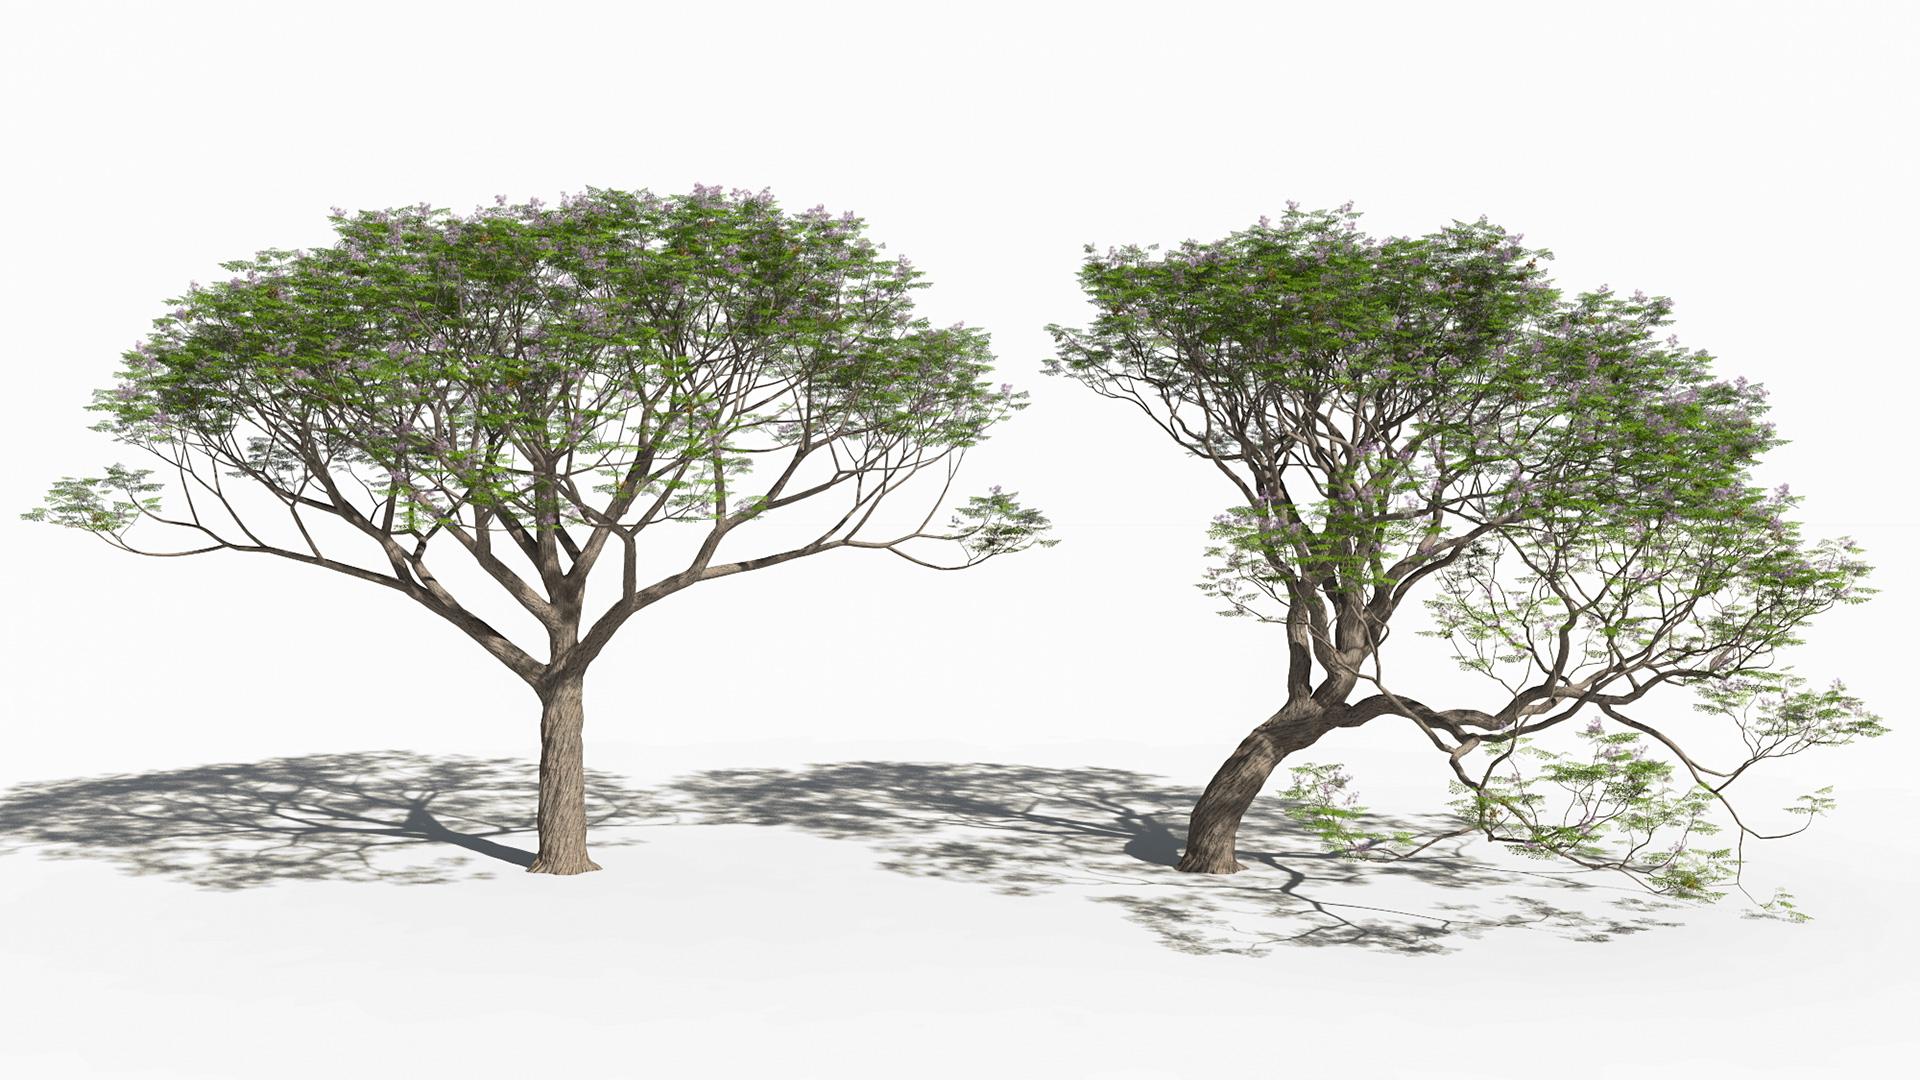 3D model of the Chinaberry tree Melia azedarach